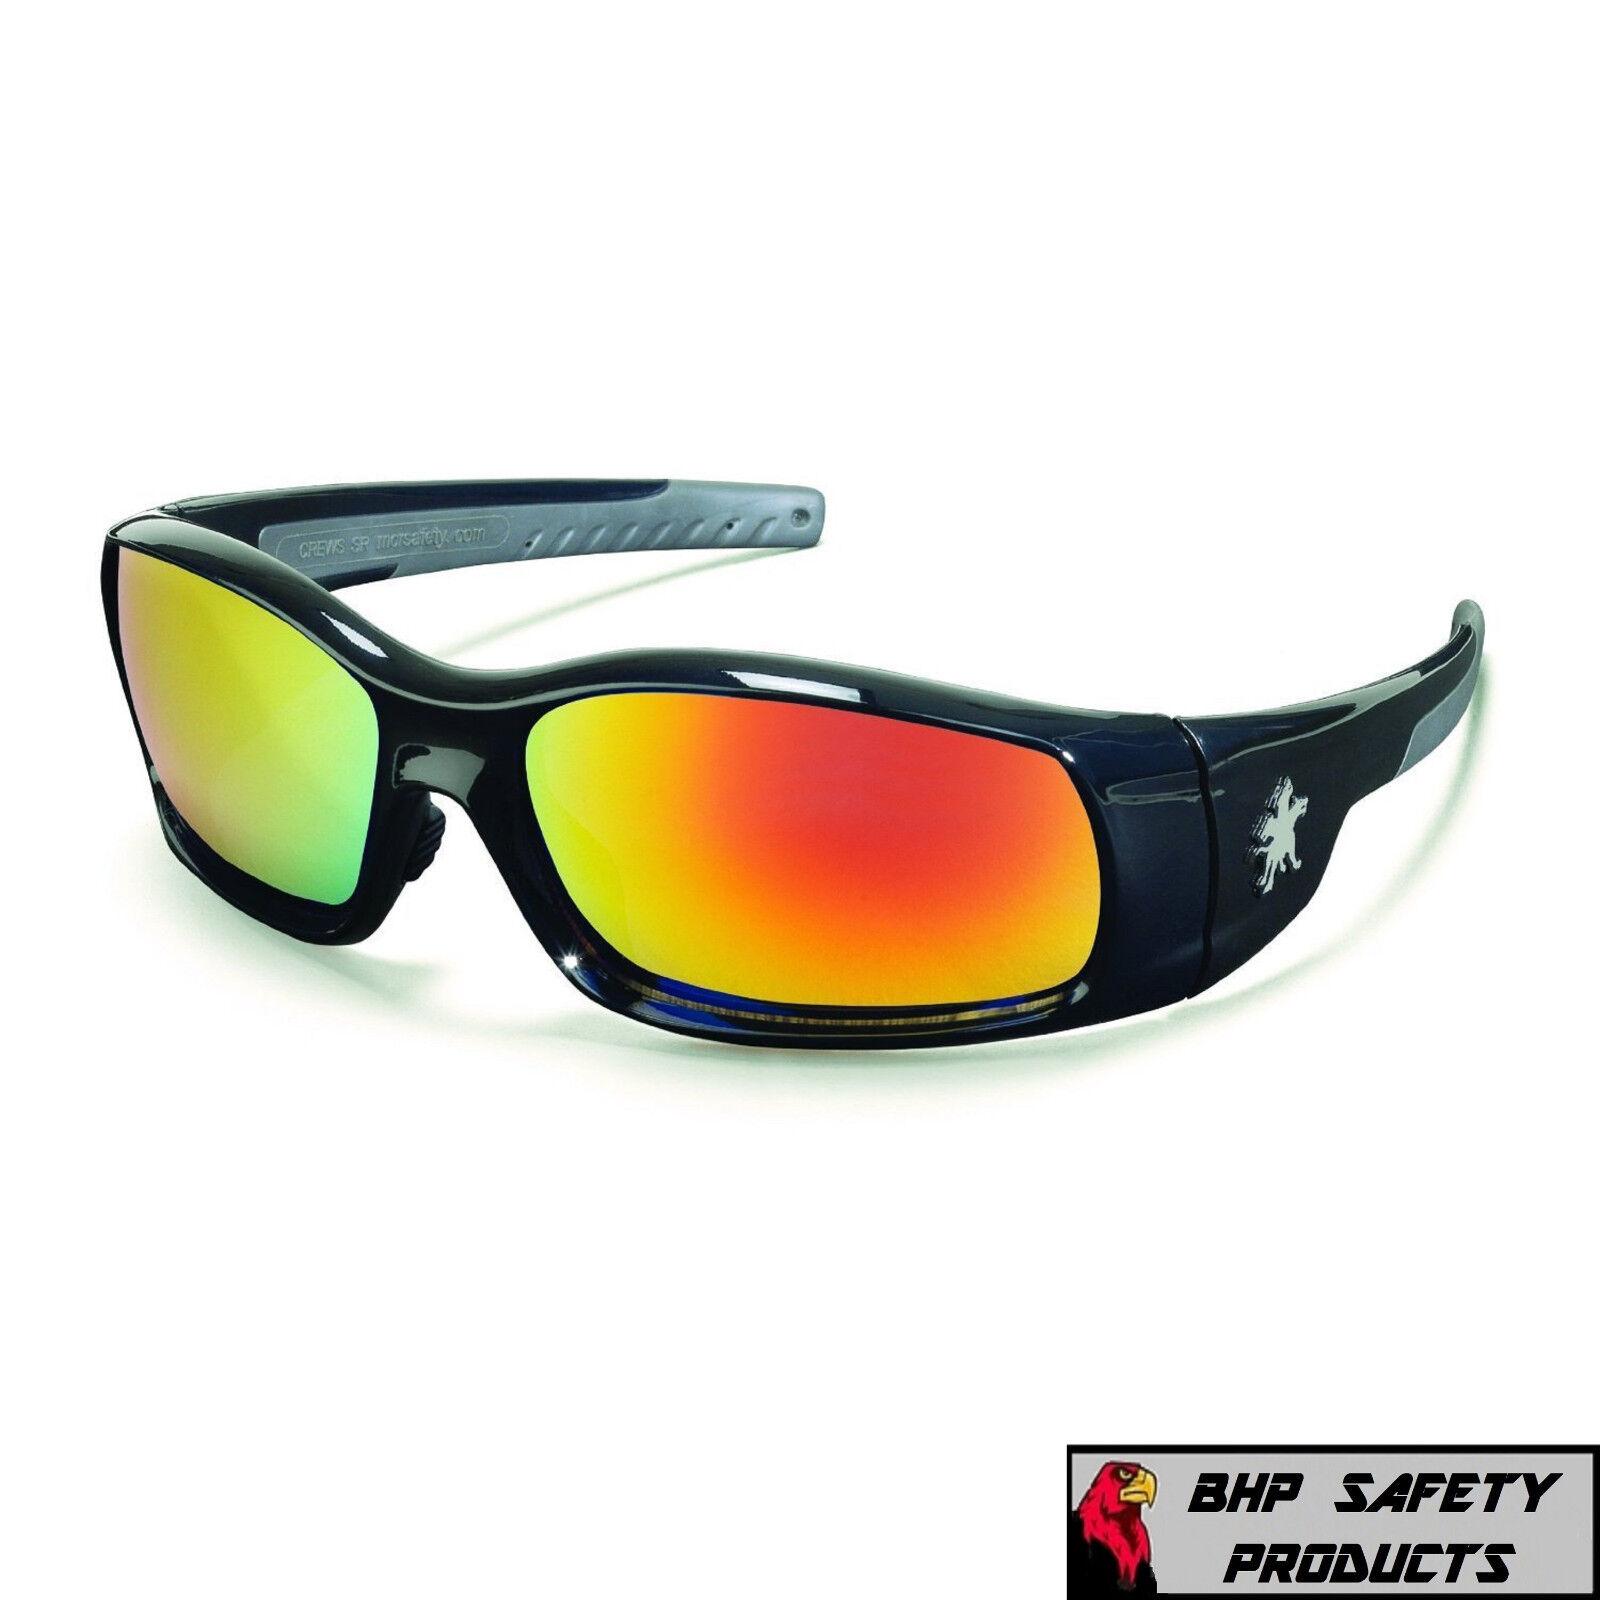 MCR CREWS SWAGGER SAFETY GLASSES SUNGLASSES WORK SPORT EYEWEAR CHOOSE YOUR COLOR SR11R FIRE MIRROR/BLACK FRAME